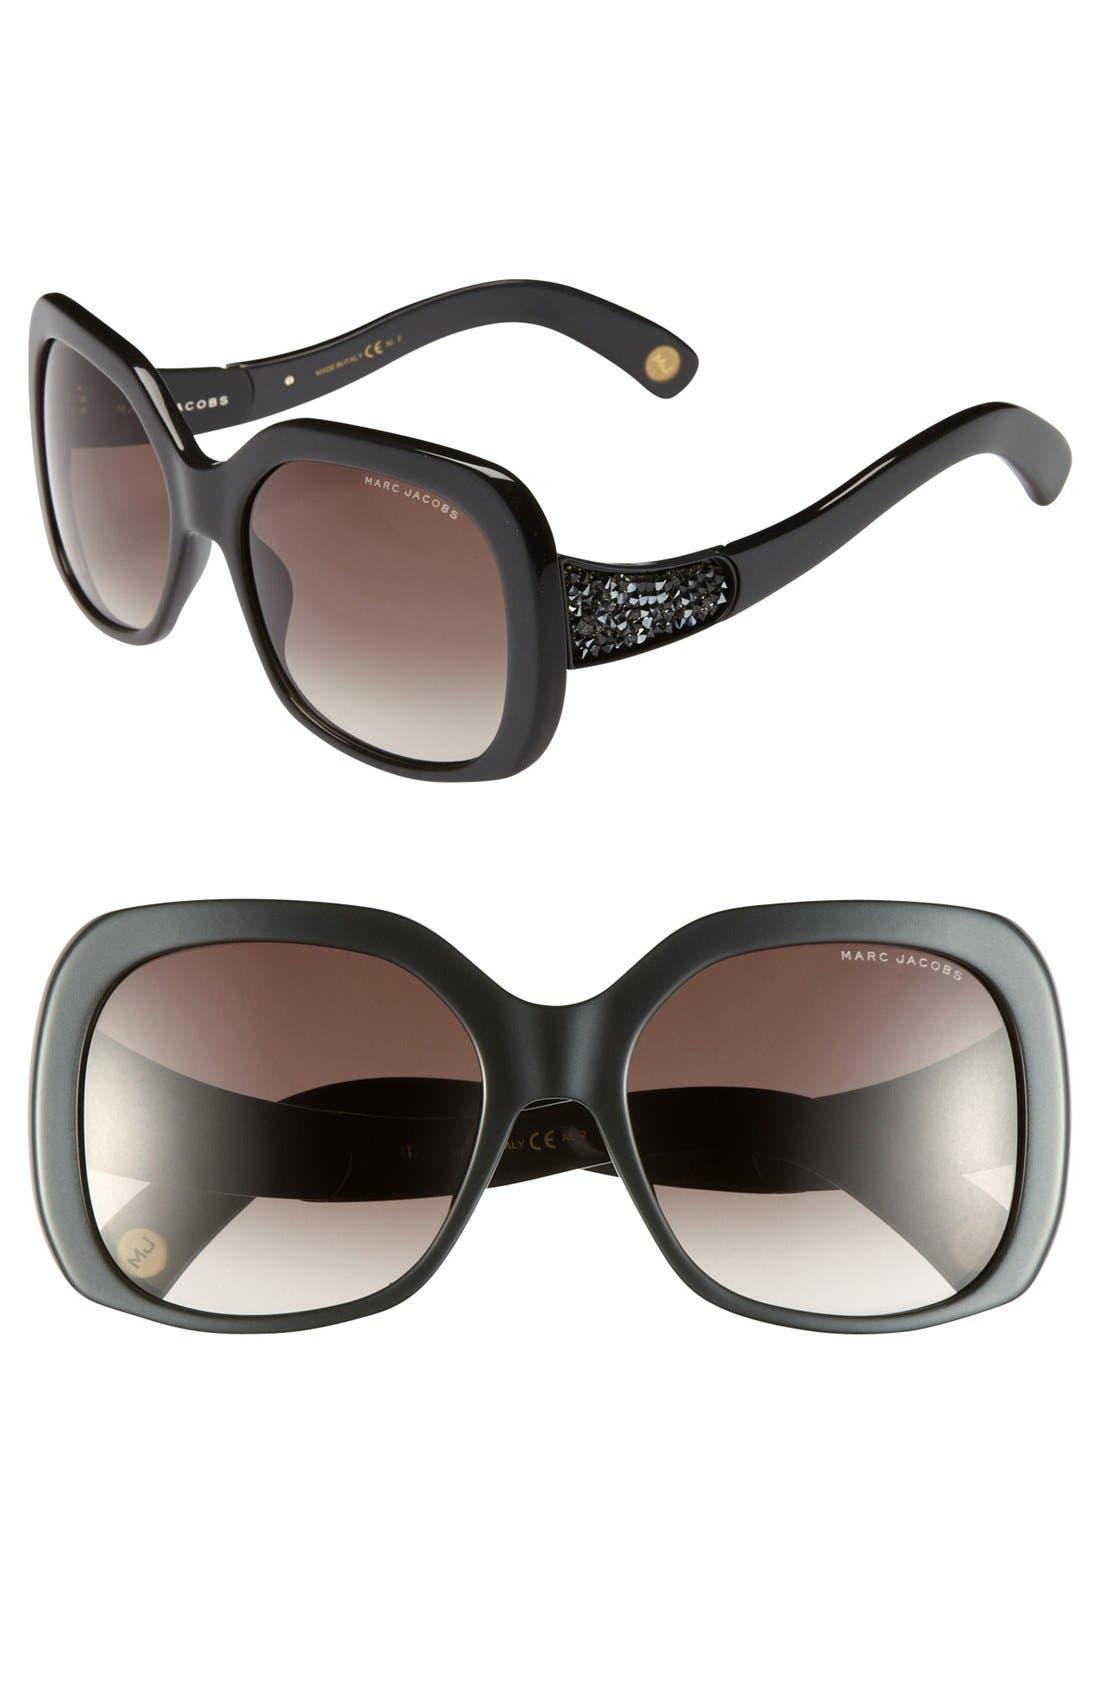 Main Image - MARC JACOBS 57mm Sunglasses